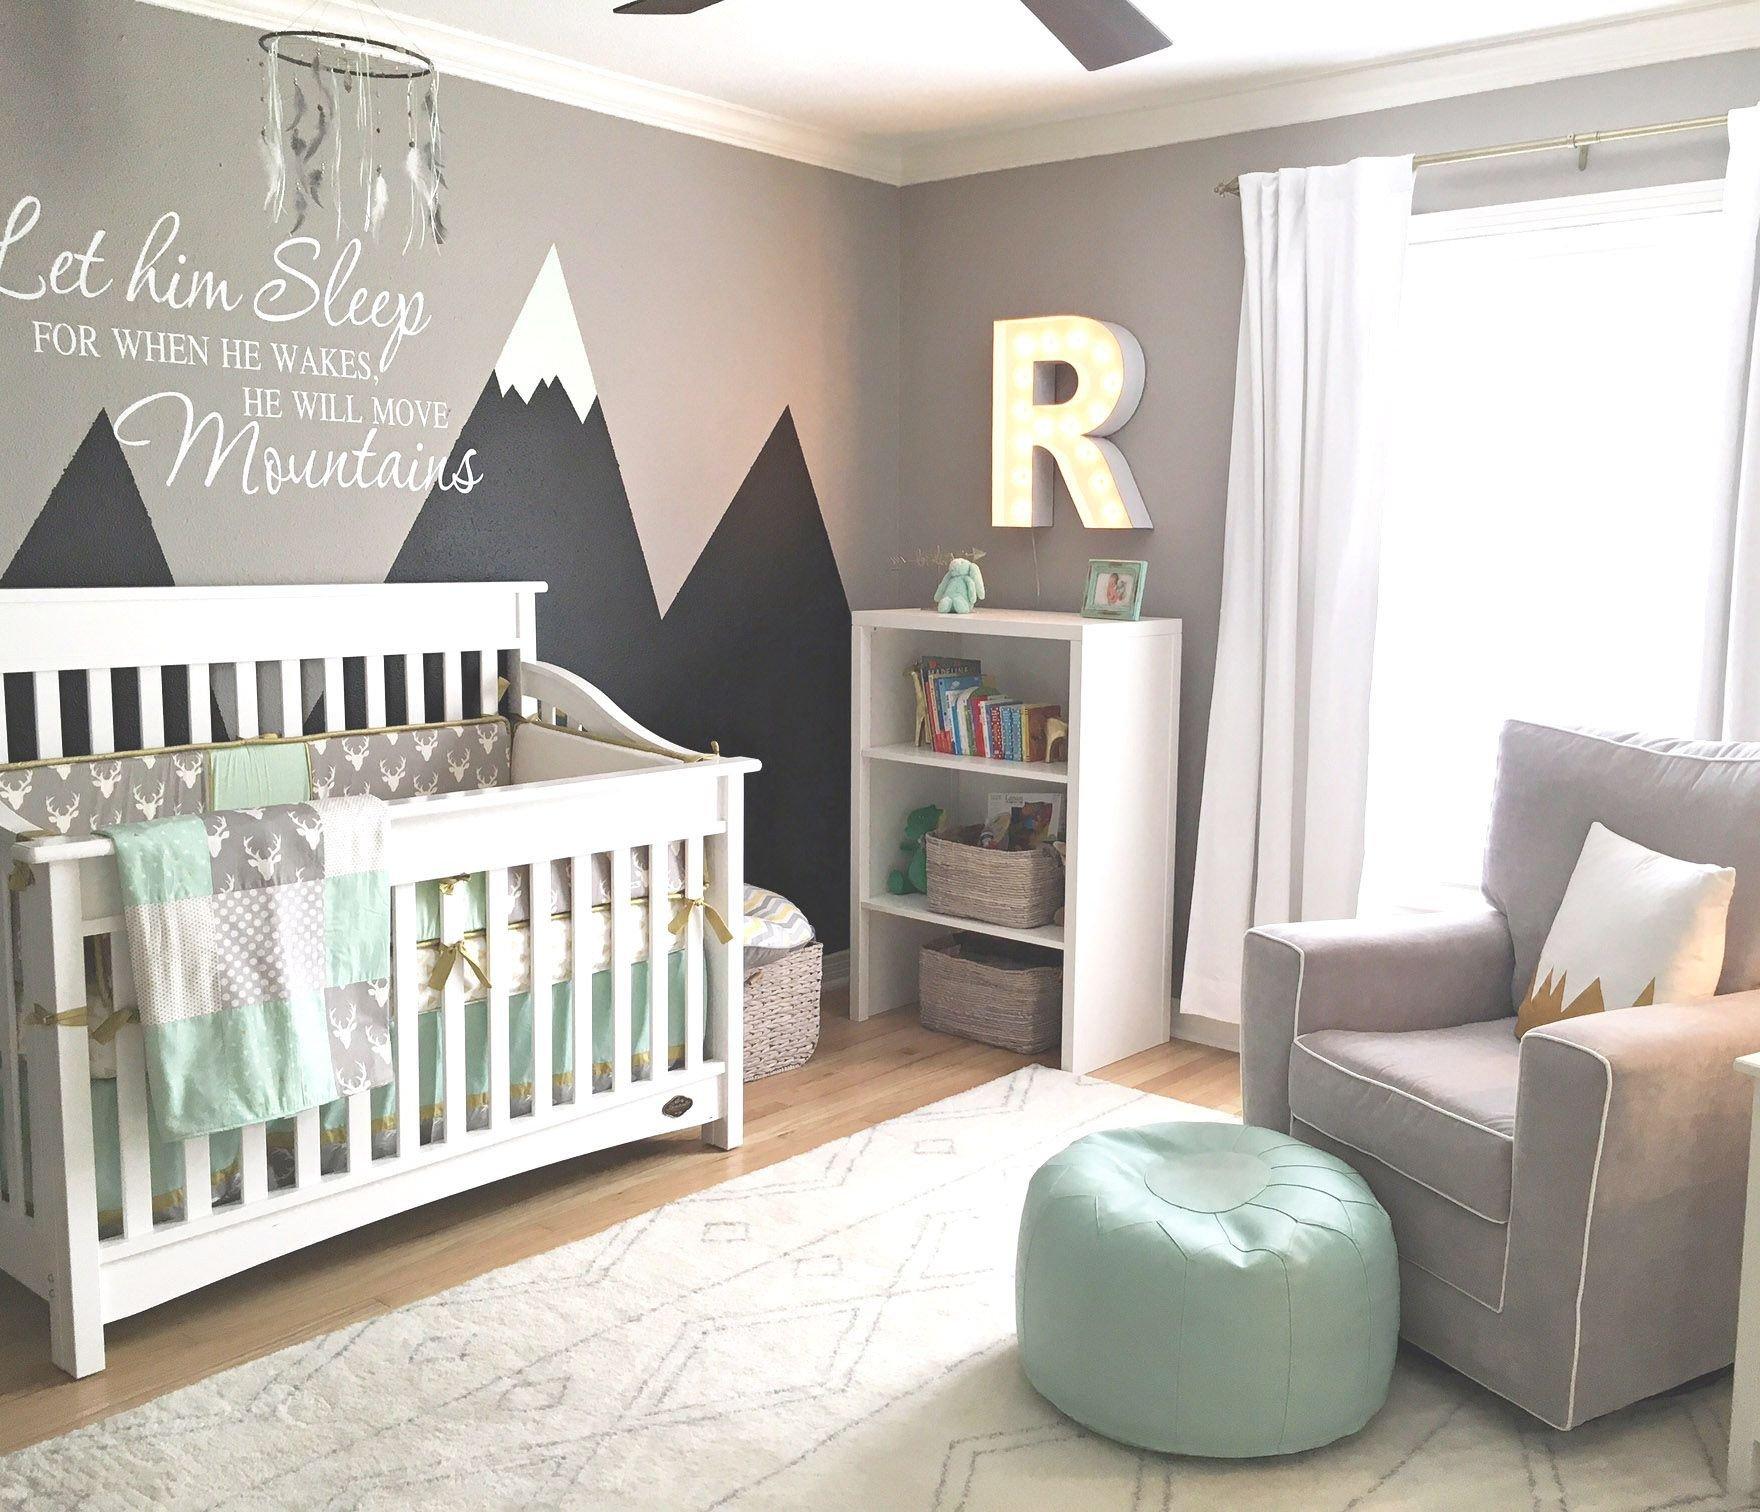 Boy Baby Bedroom Ideas Lovely Design Reveal Mountain Inspired Nursery